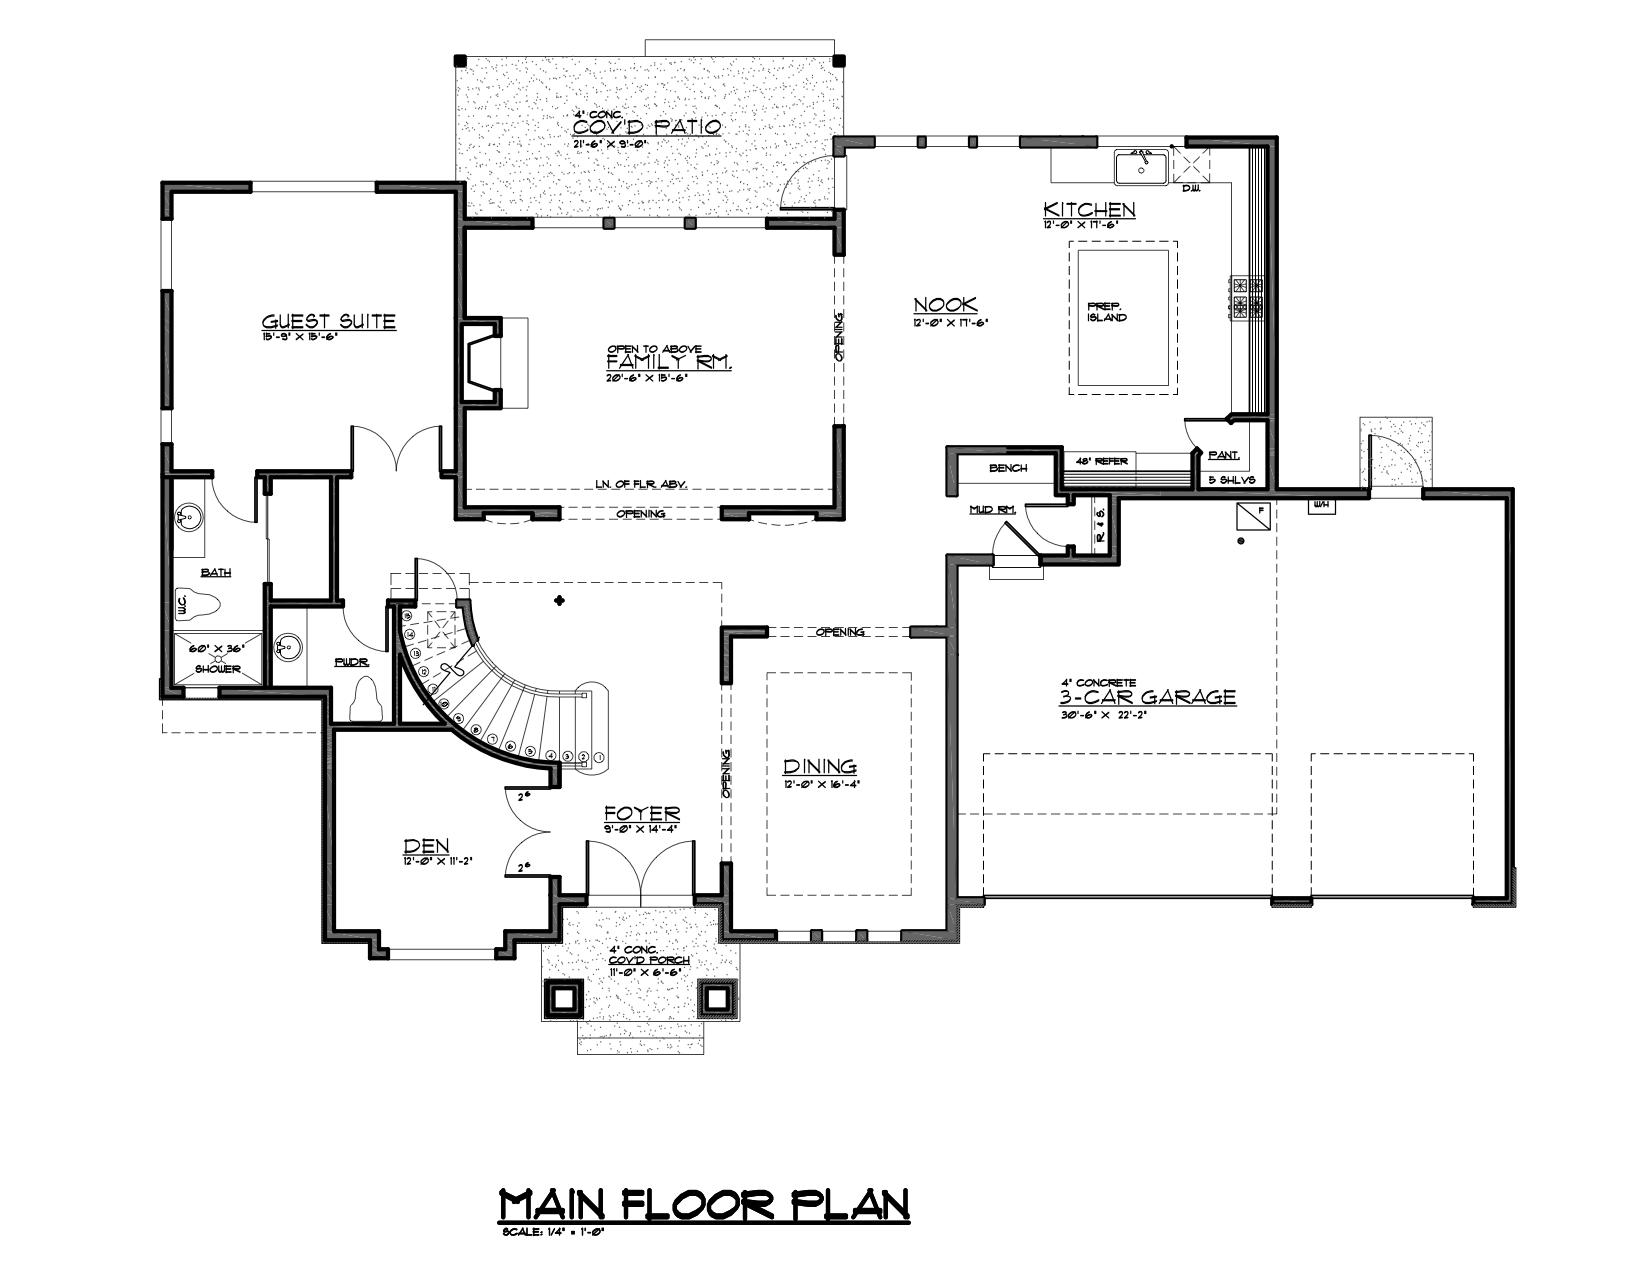 Islander 8620 SE 47th St Main Floor.png